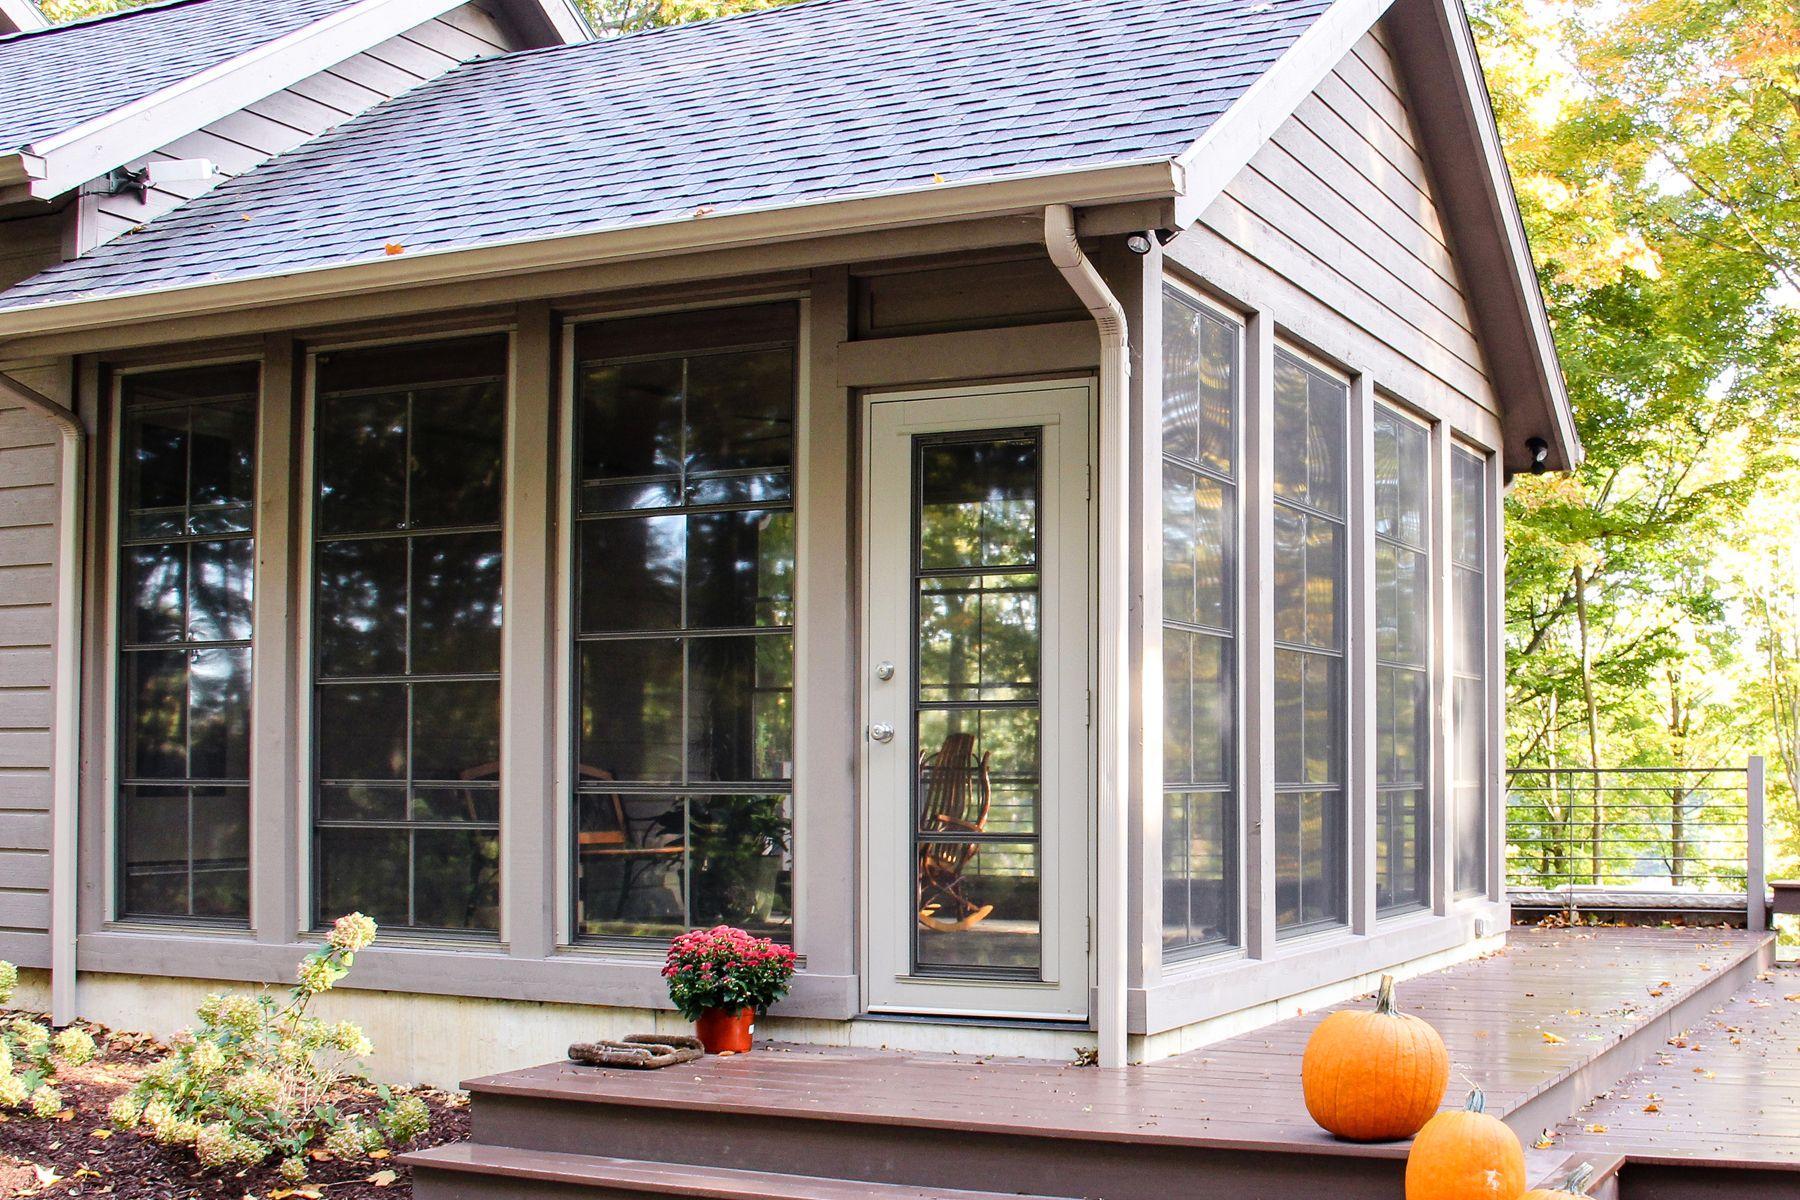 Ordinaire Patio Enclosures · Brand New Porch By Martin Bros. Contracting, Inc.,  Window Enclosures By Raber